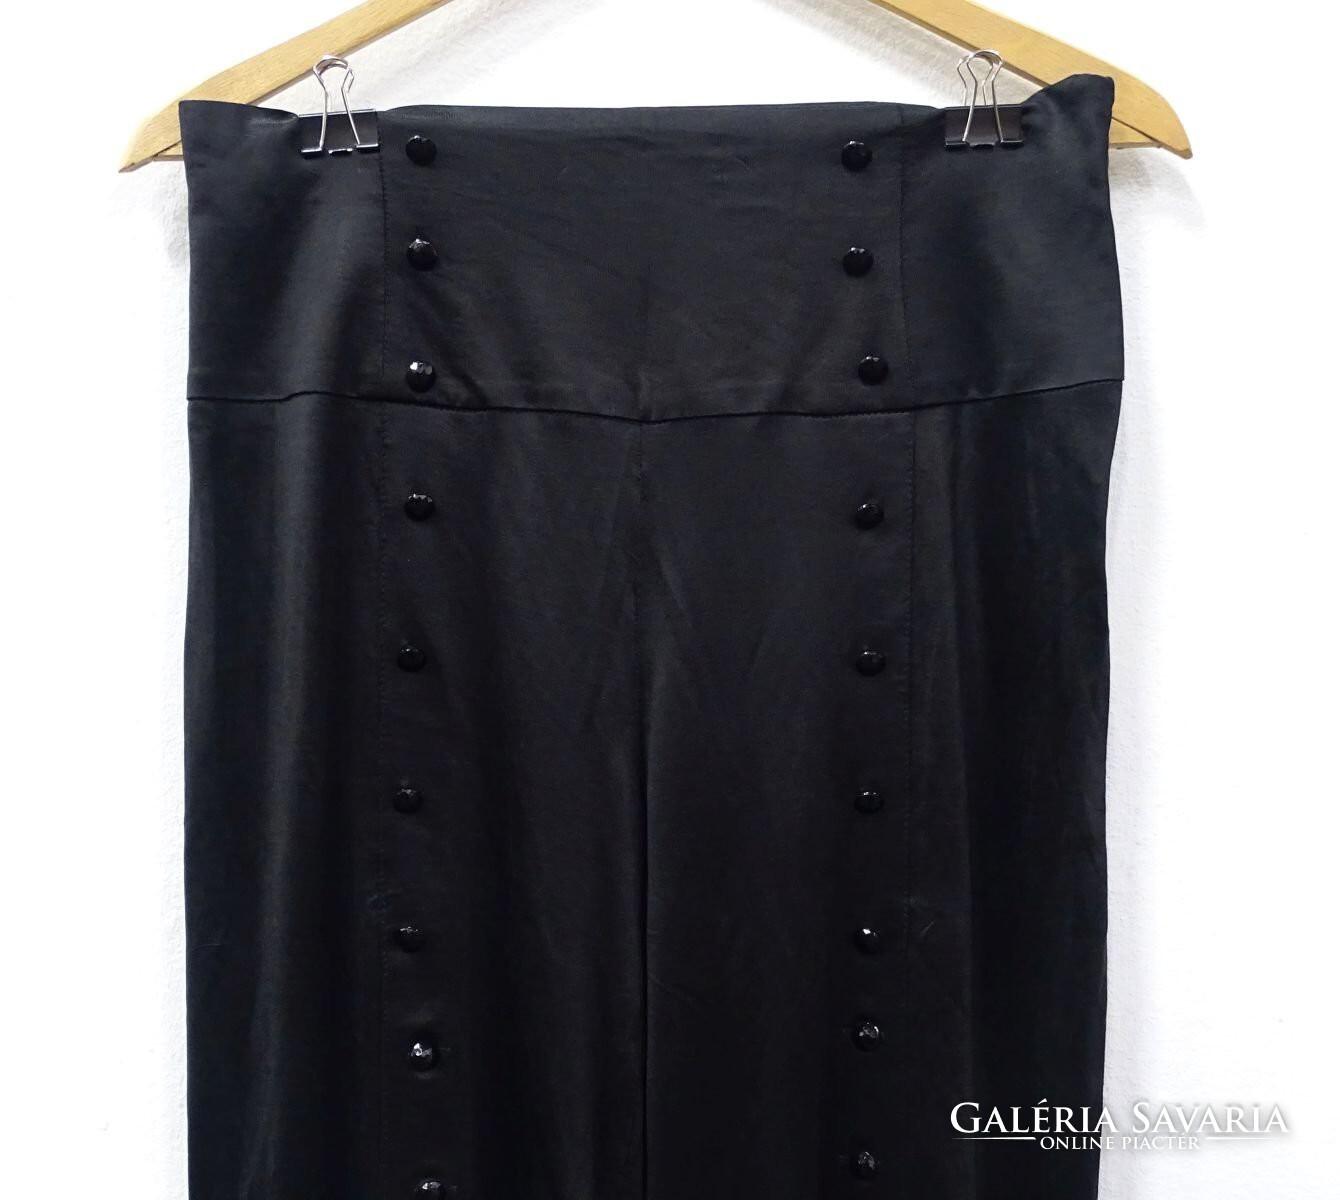 0V872 Versace fekete férfi farmernadrág 46 os Wardrobe